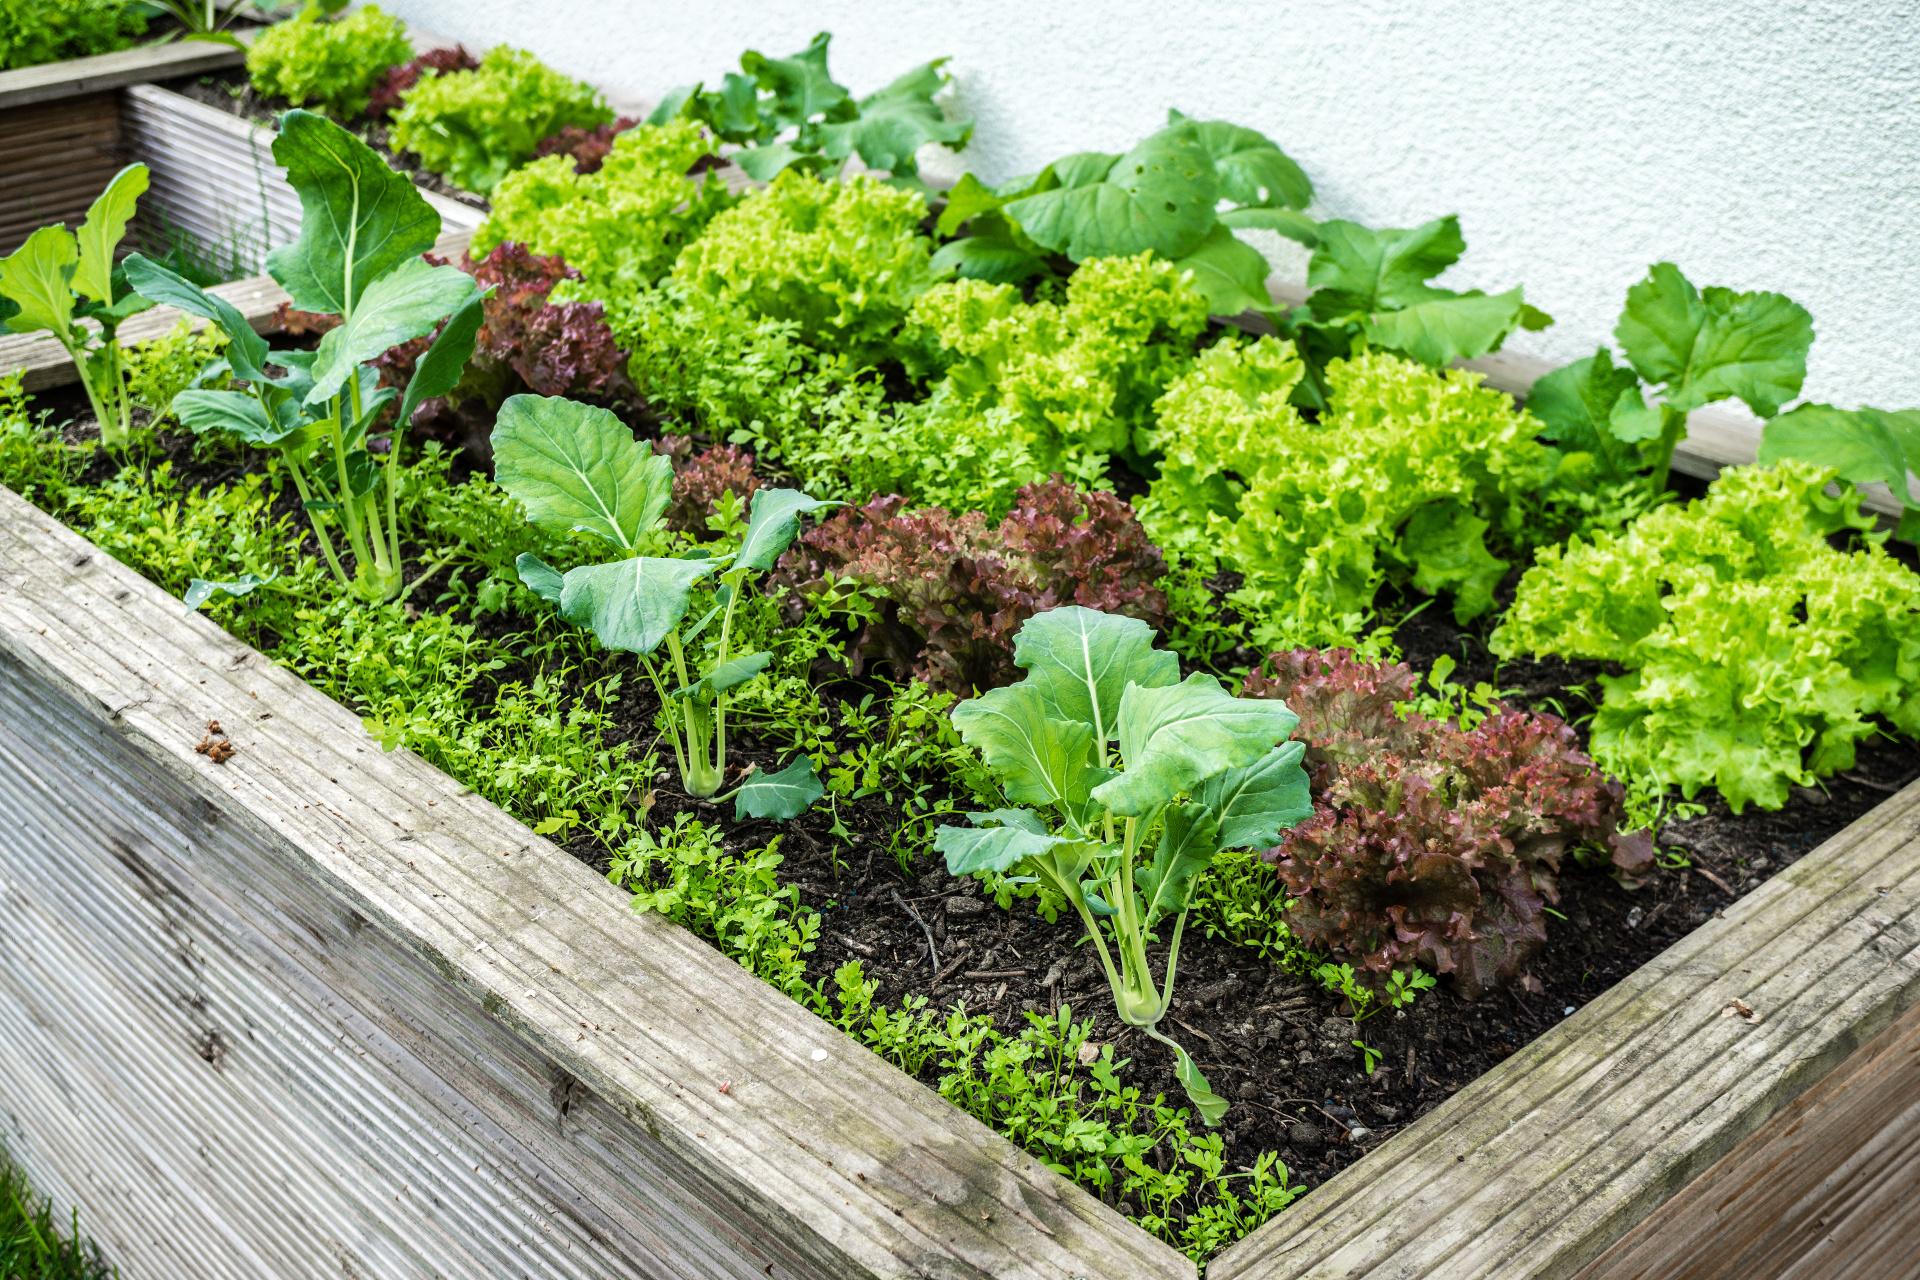 Low Budget Hochbeet Selber Bauen Anleitung Tipps Zur Bepflanzung